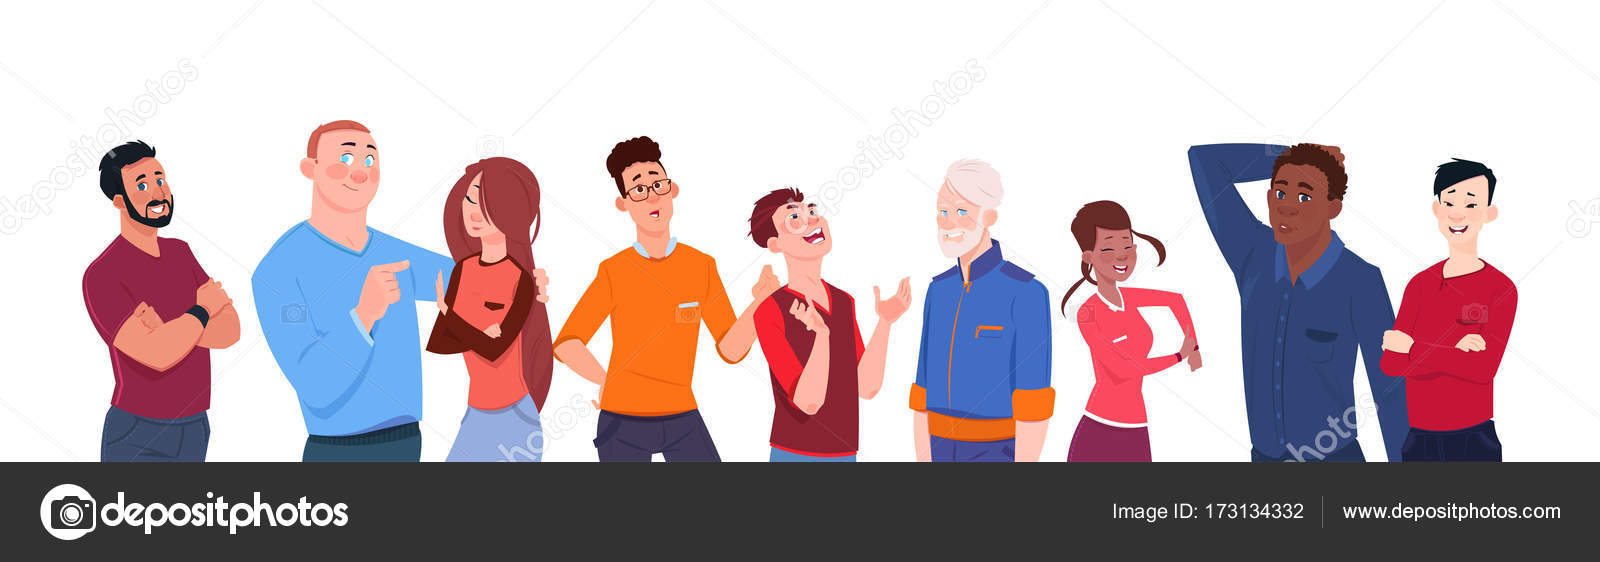 Grupo De Dibujos Animados De Carrera De Mezcla Personas De